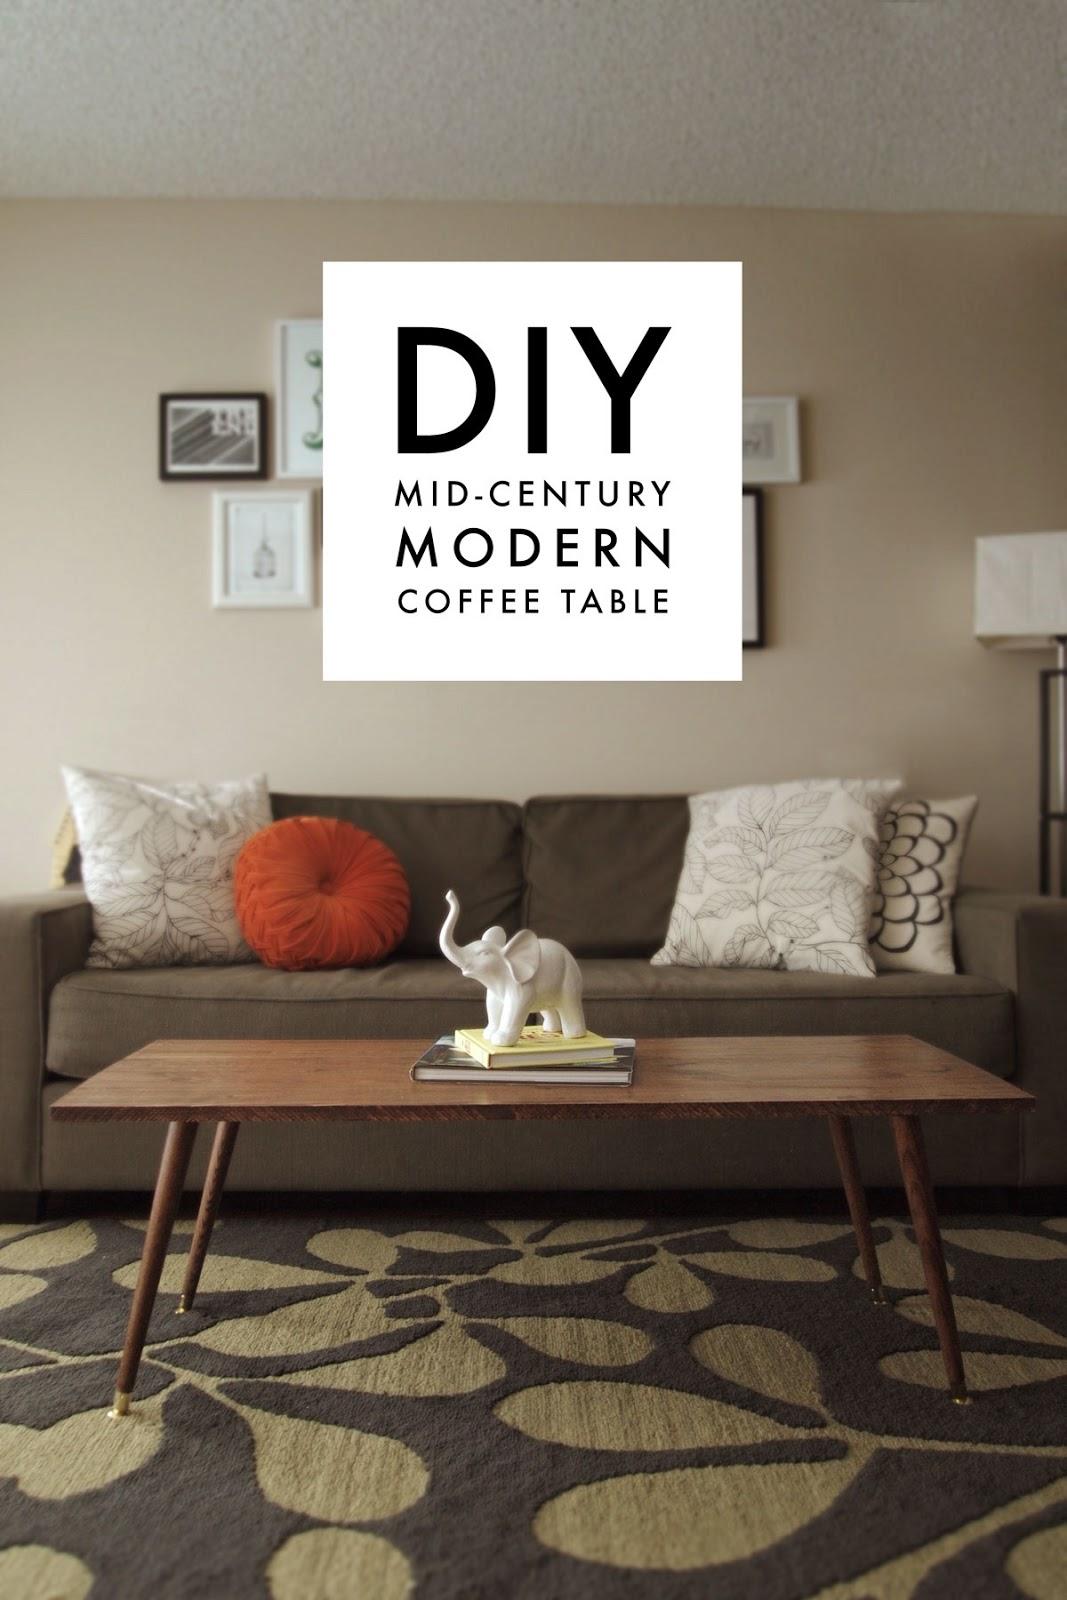 diy mid-century modern coffee table – jamie bartlett design